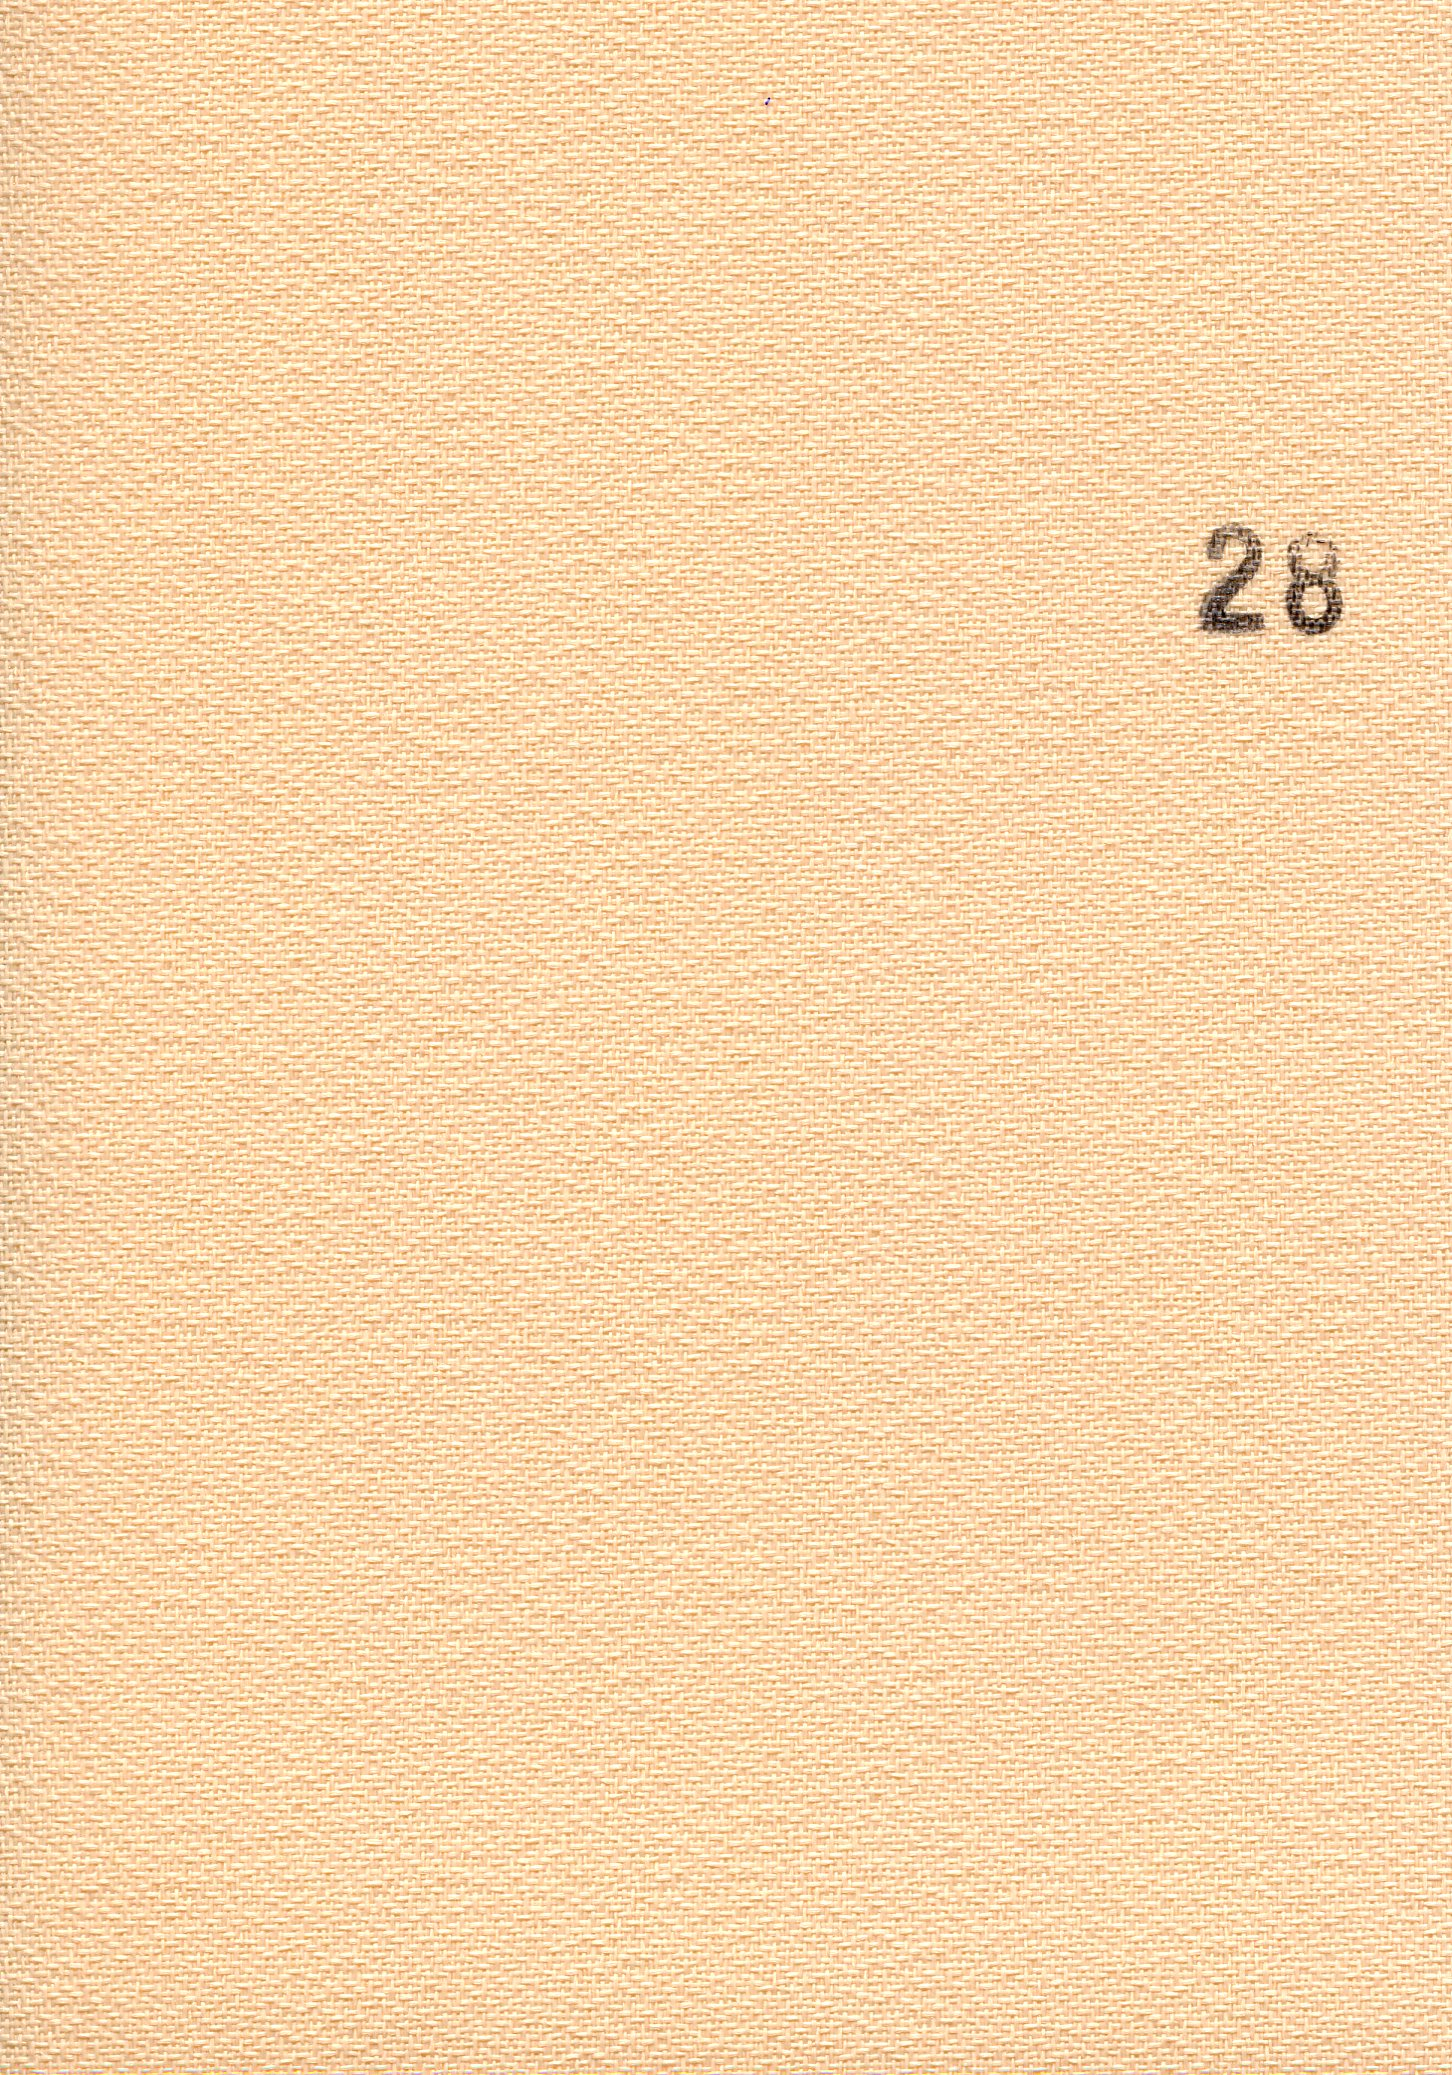 Creppe 28